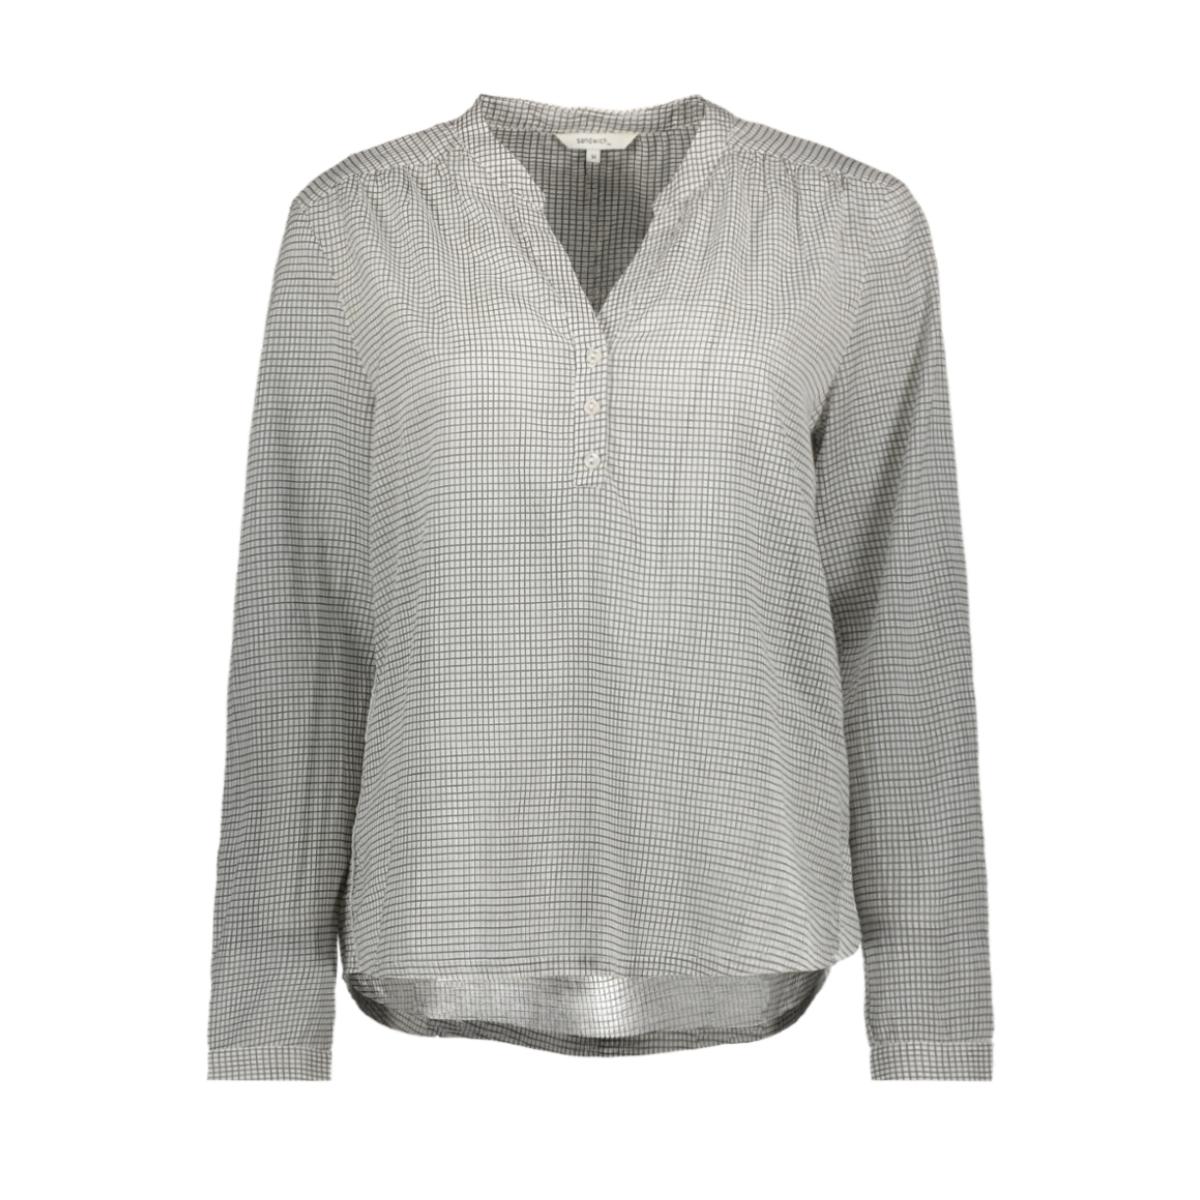 blouse met ruitpatroon 22001497 sandwich blouse 80076